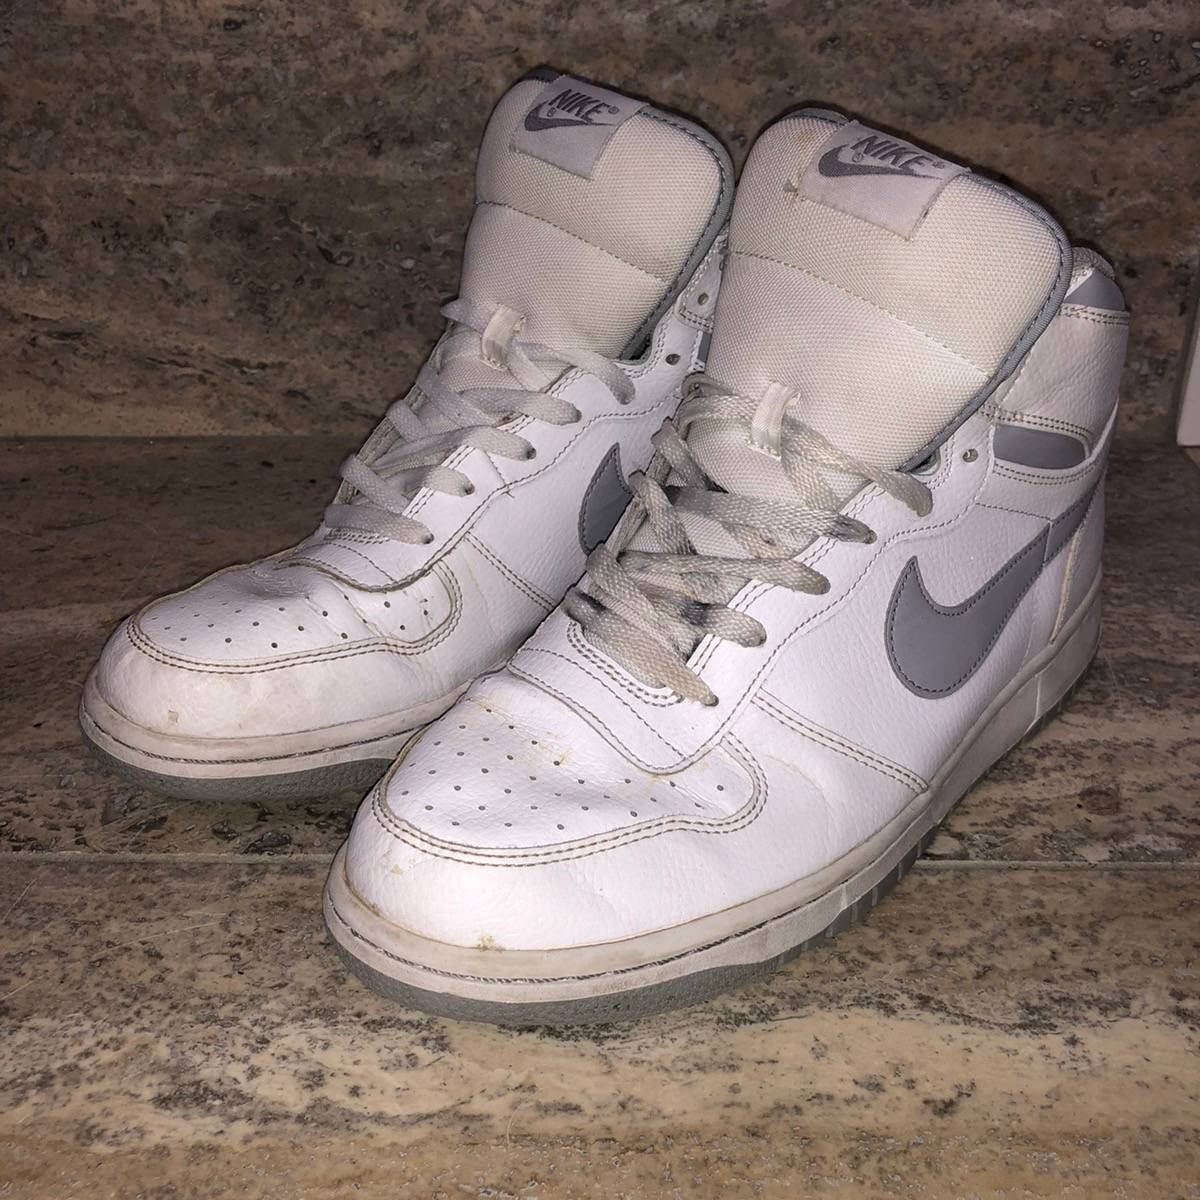 Helecho Potencial famoso  Nike Big Nike High White Wolf Grey | Grailed